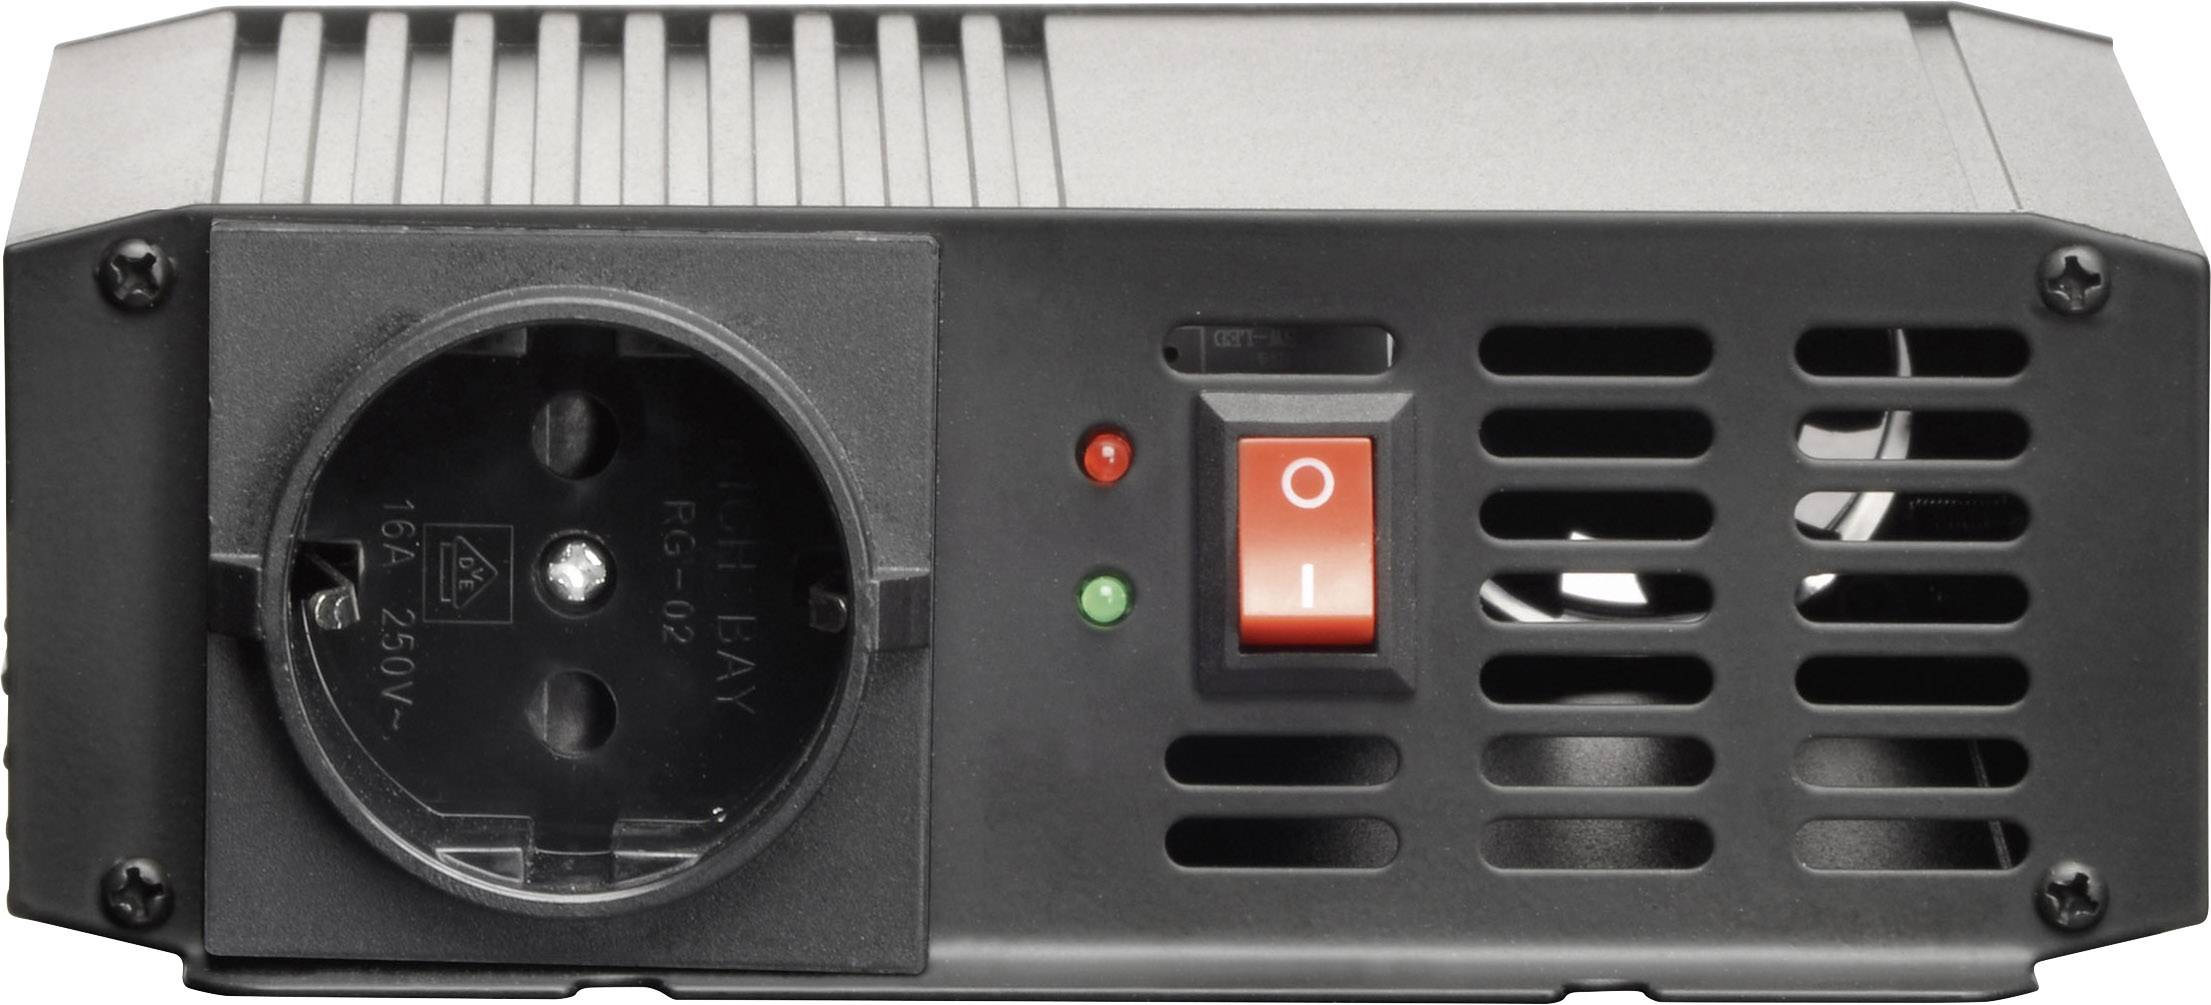 Menič napätia Voltcraft PSW 300-24-G, 24 V / DC, 300 W